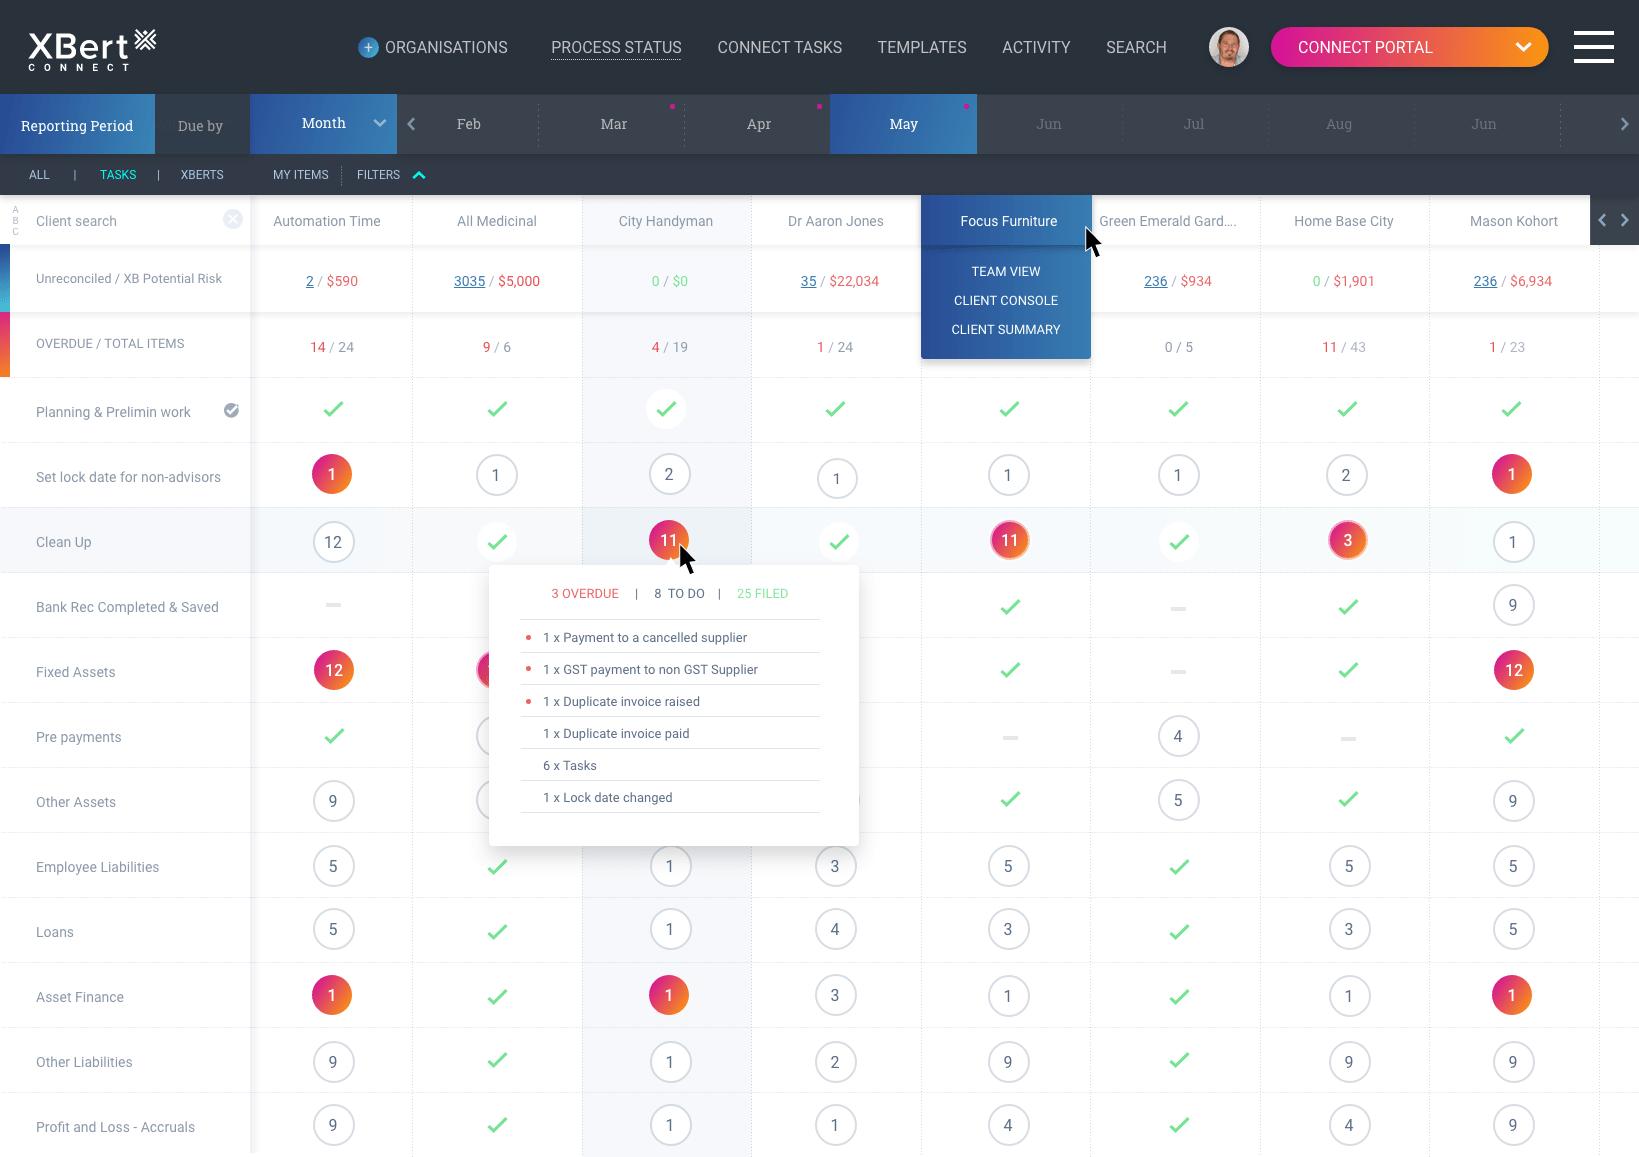 XBert Connect Portal